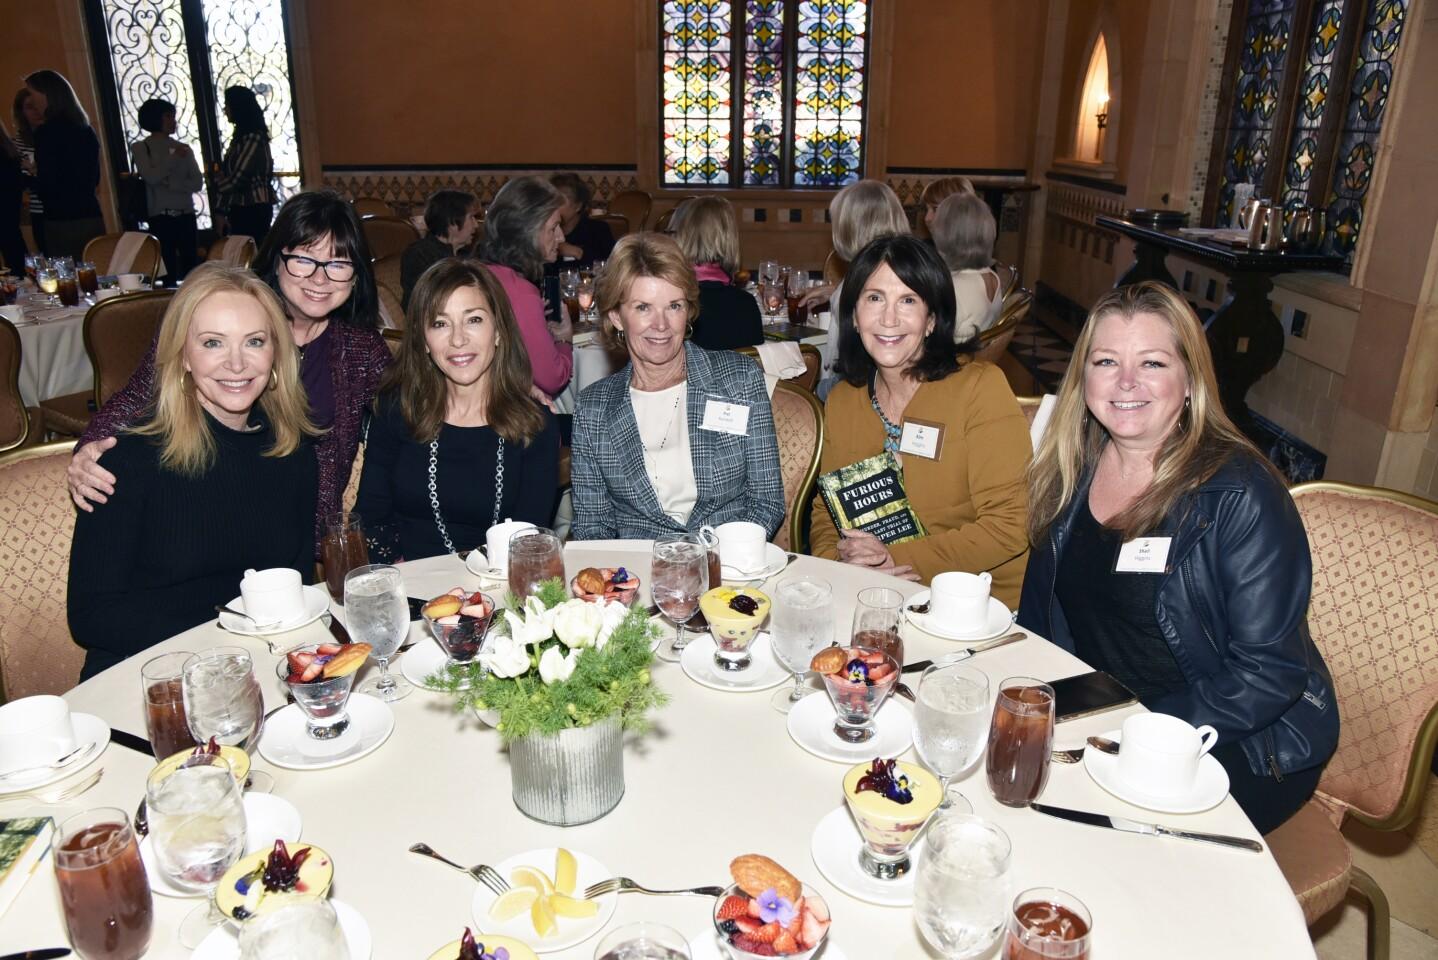 Sandra Maas, Jeanne Decker, Judi Rowles, Pat Randall, Kim Higgins, Sheli Higgins